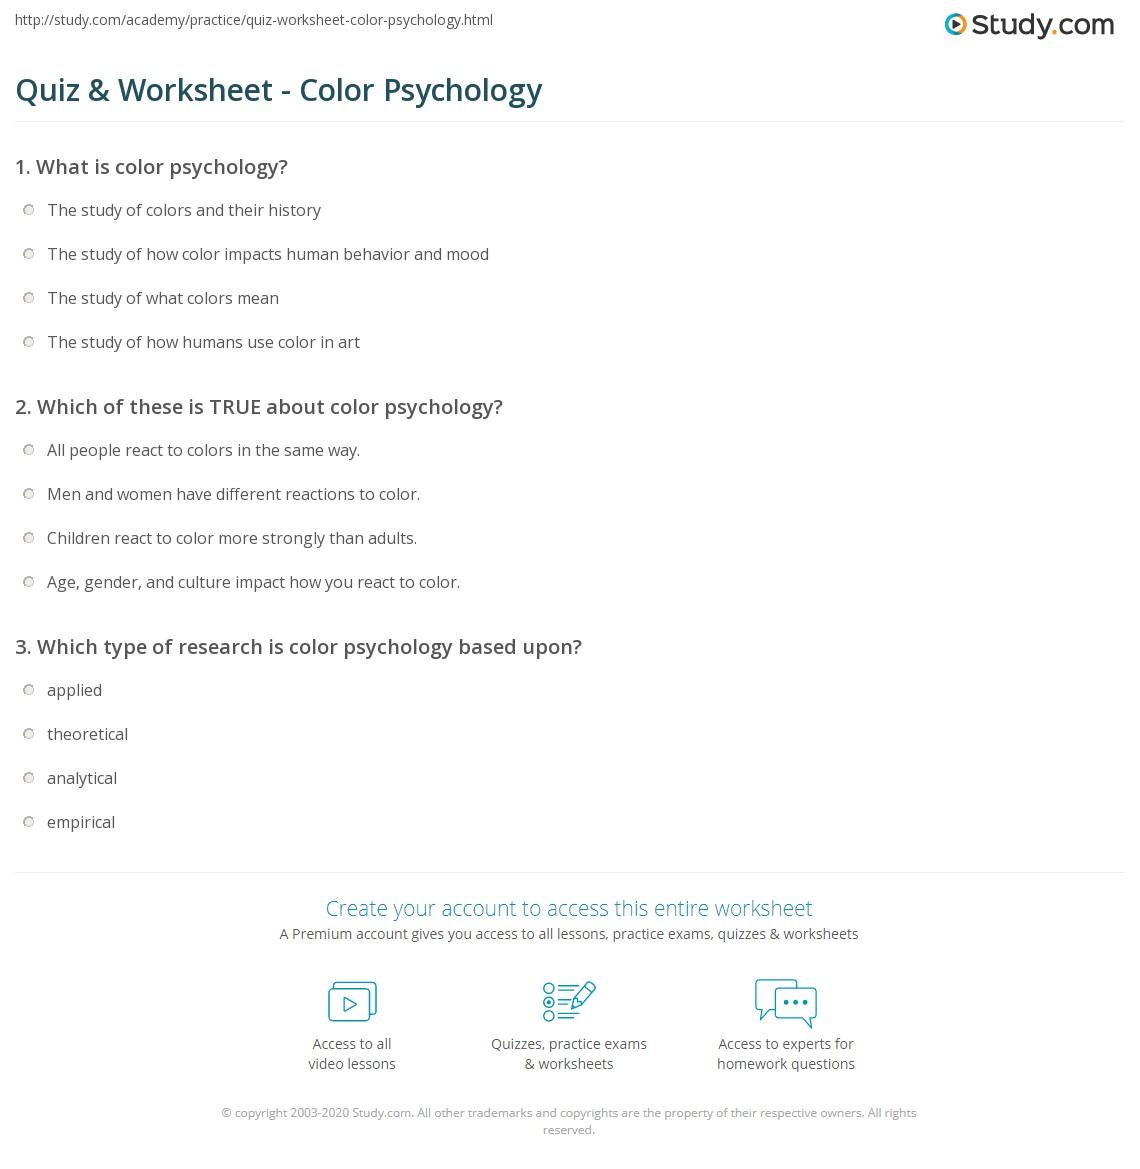 Quiz & Worksheet - Color Psychology | Study.com